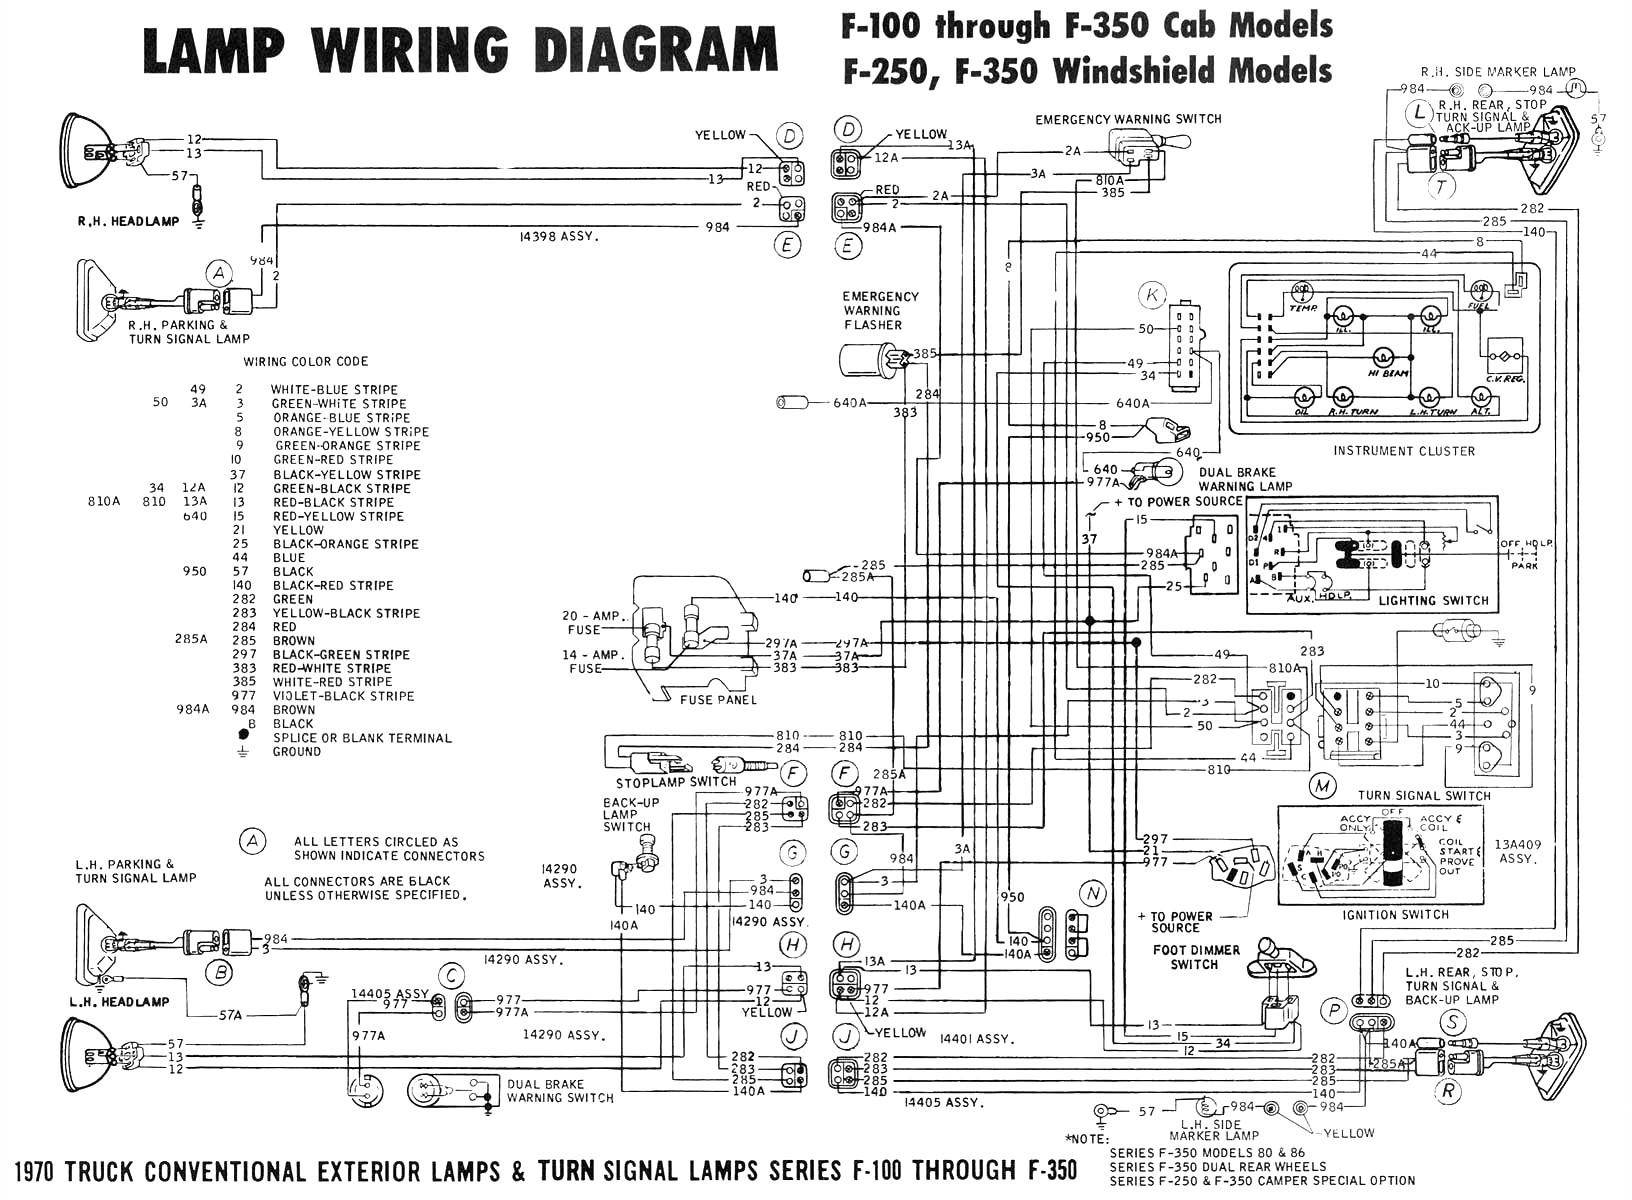 1997 f 250 sd transmission wiring harness diagram wiring diagram files